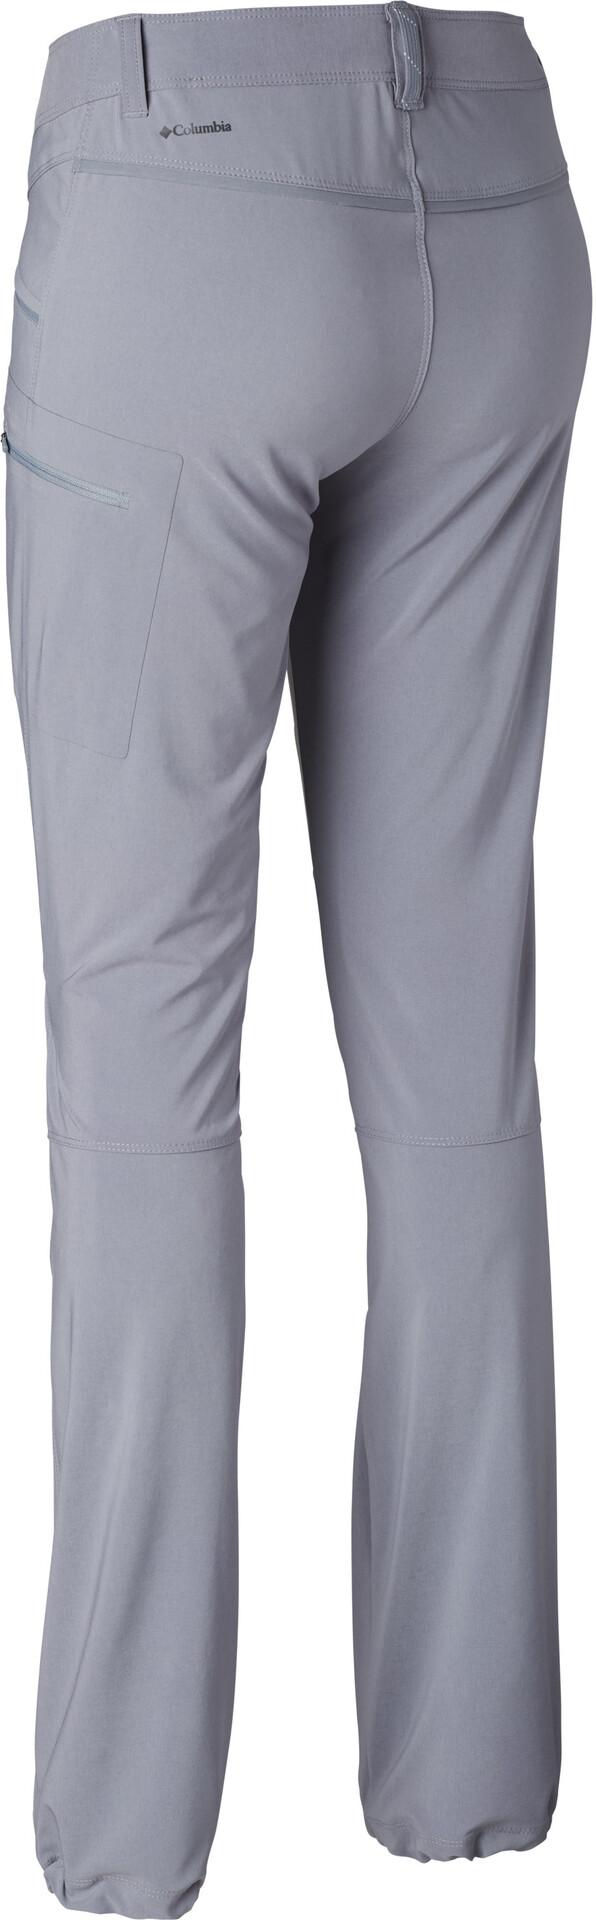 Columbia Peak To Point Hose Pantalones para Mujer